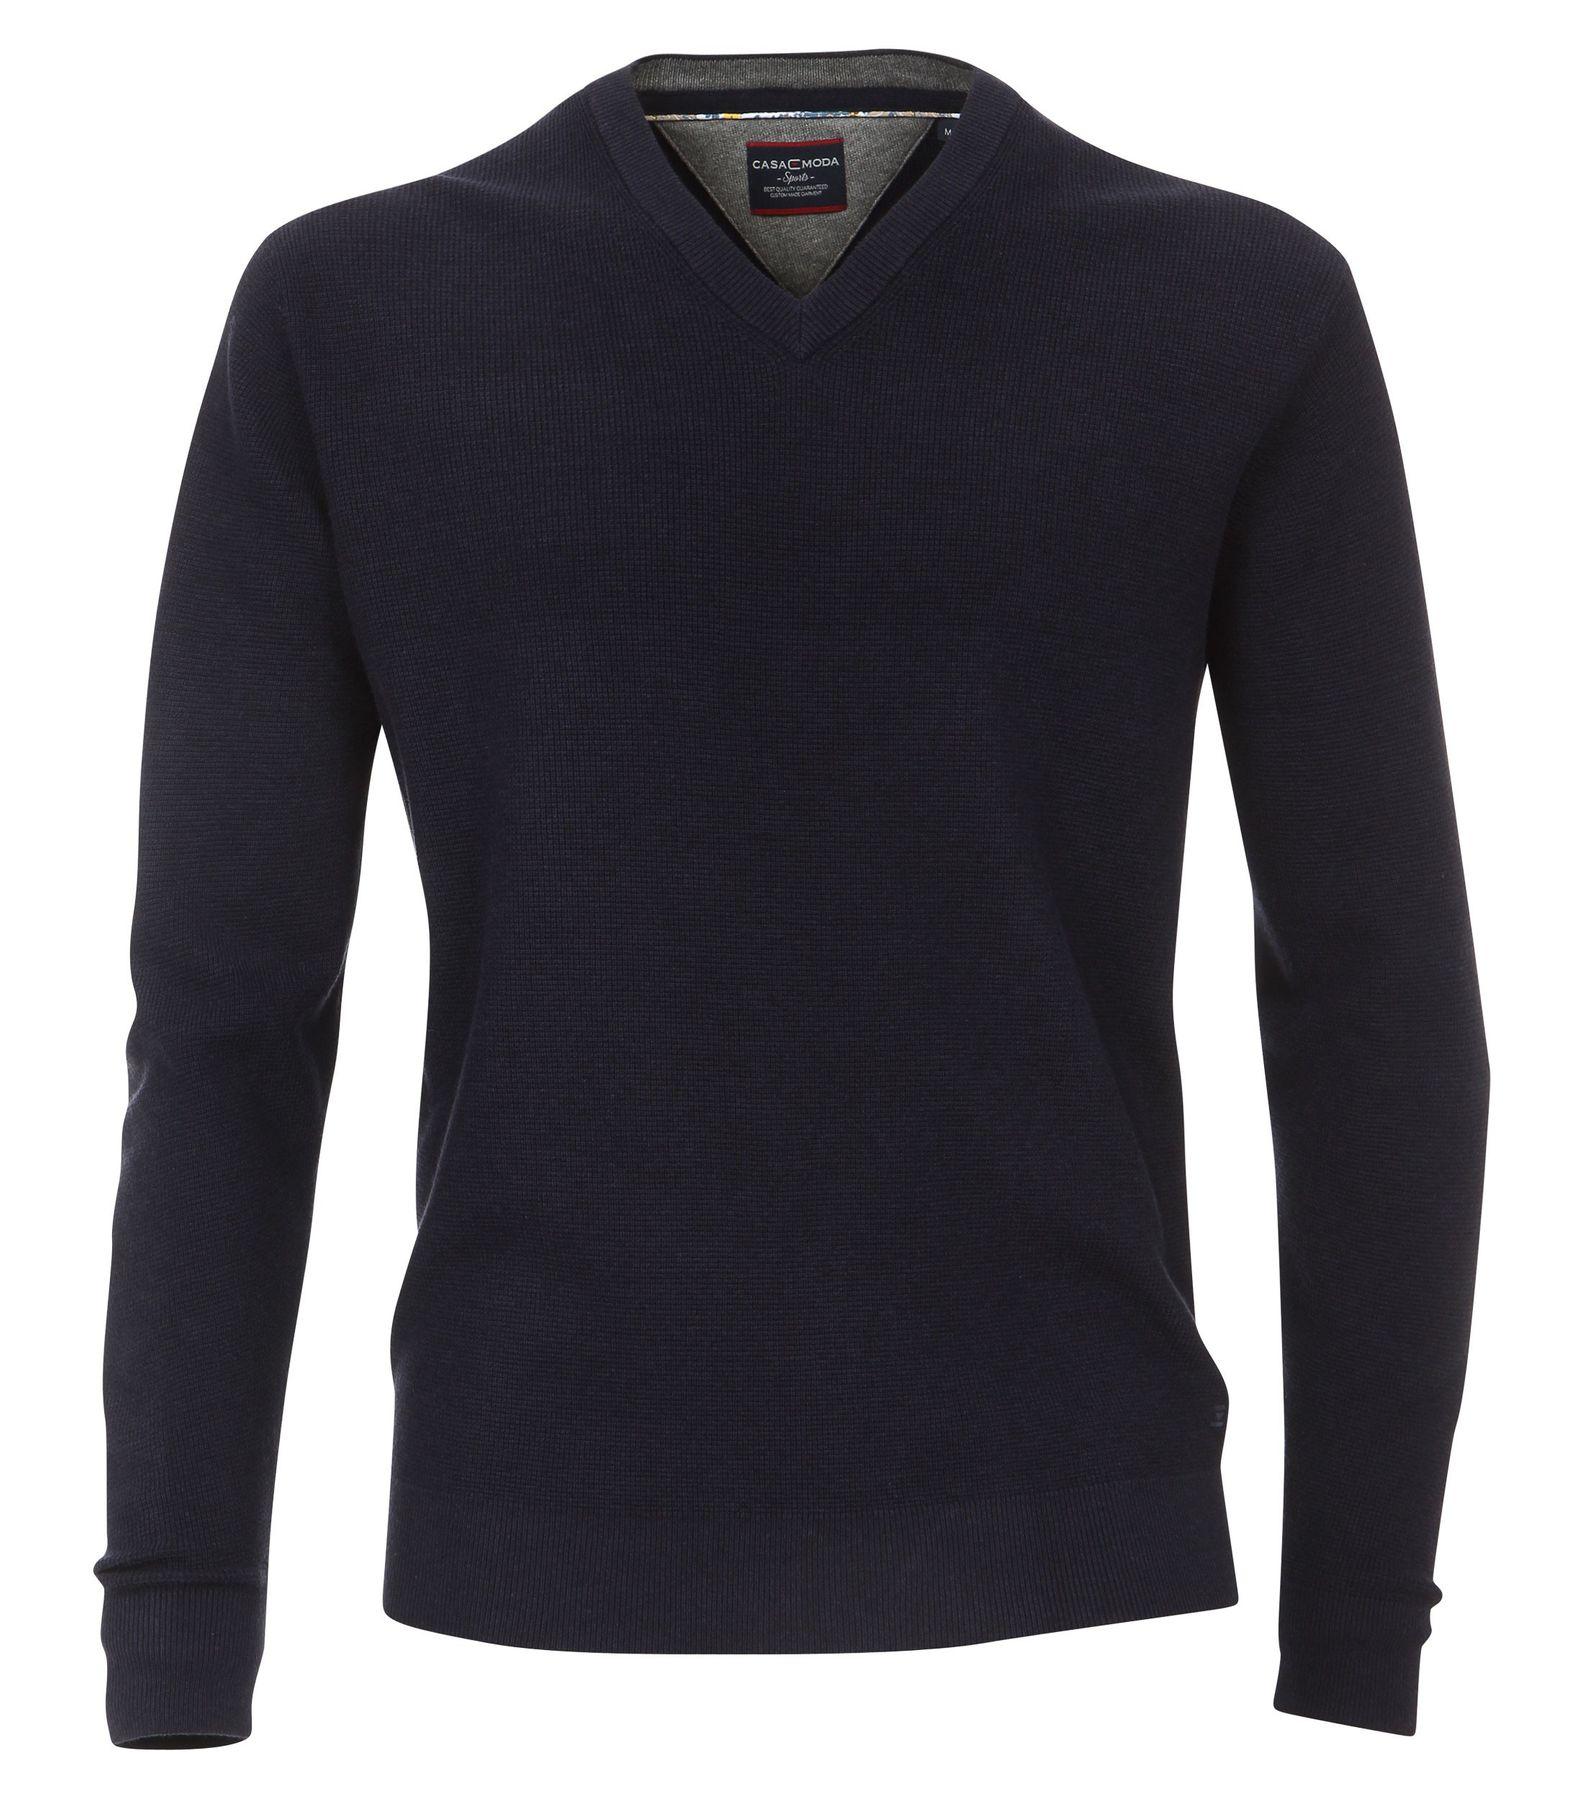 Casa Moda - Unifarbener Herren Pullover mit V-Ausschnitt  (472625000A) – Bild 1